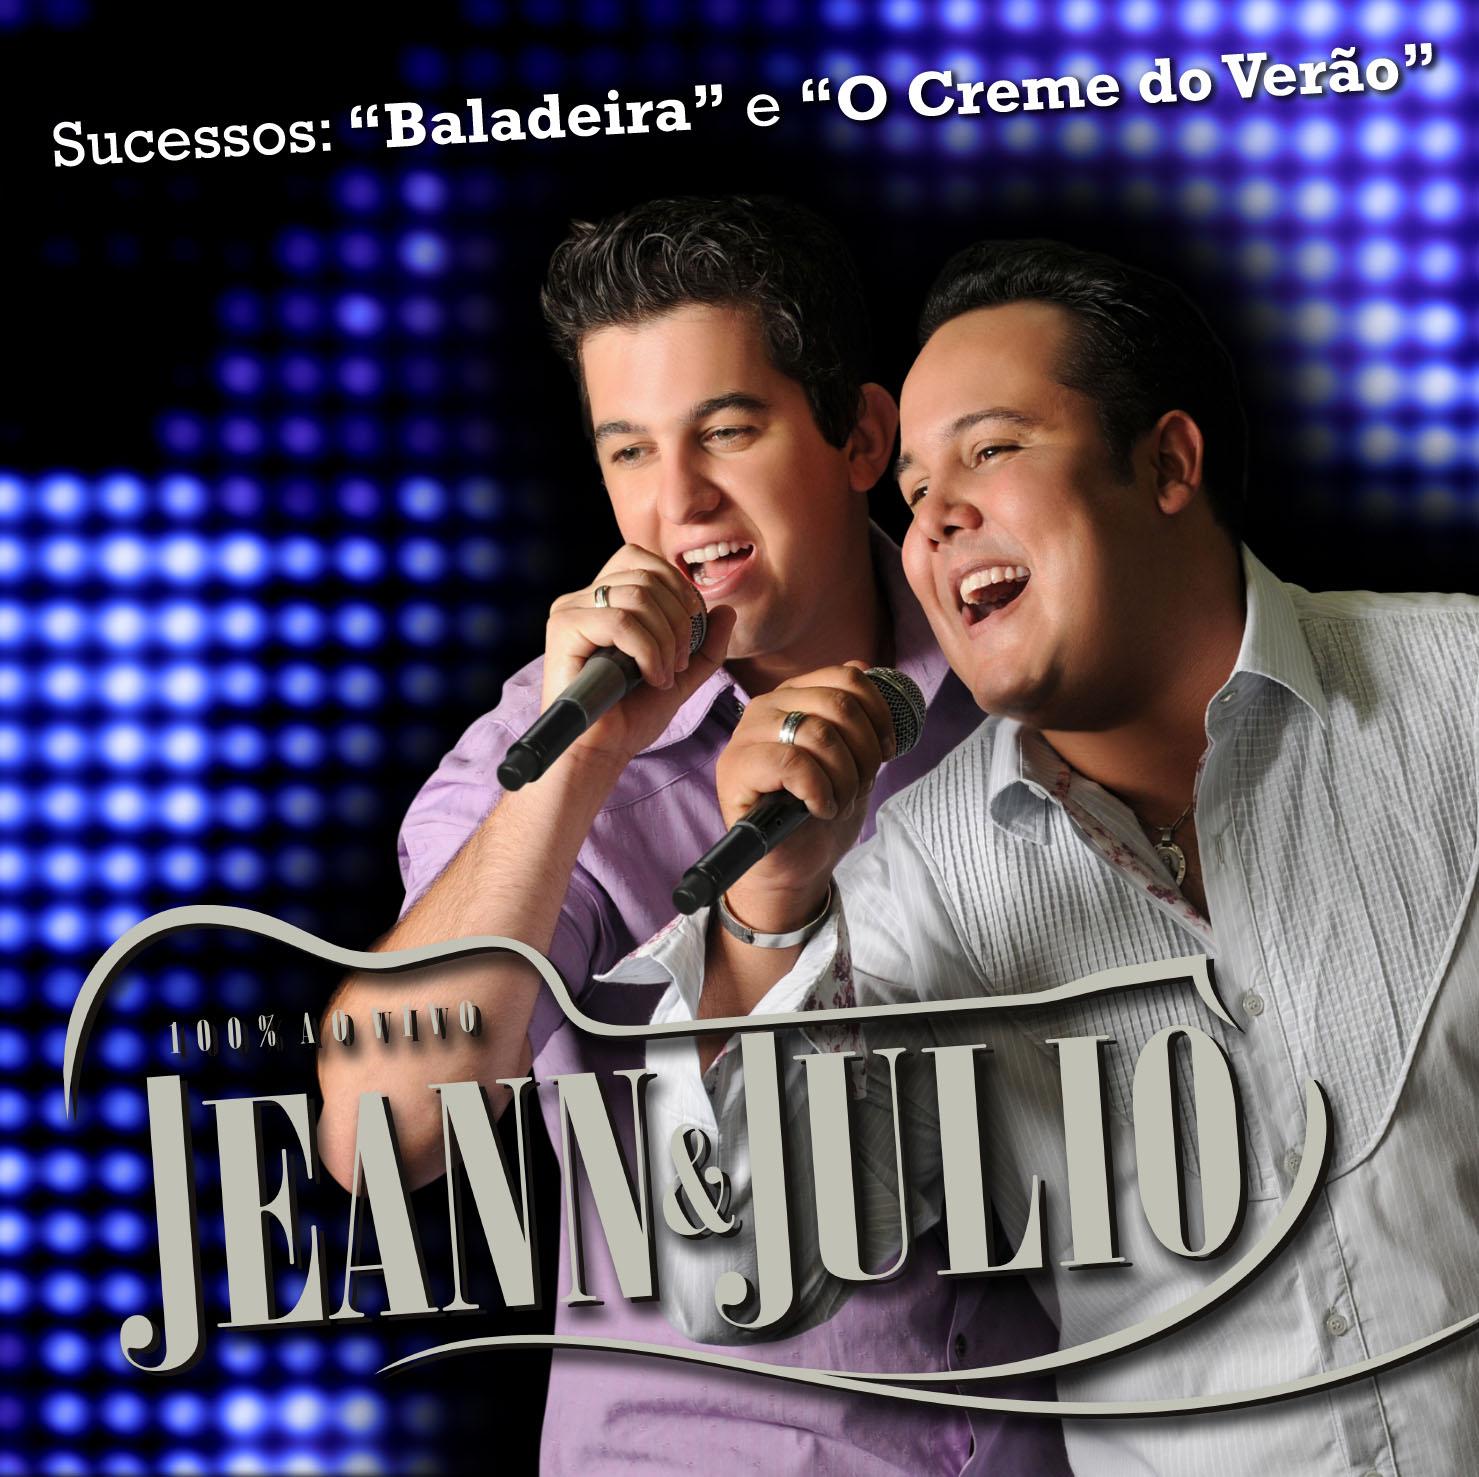 logo dupla sertaneja Jeann e Julio